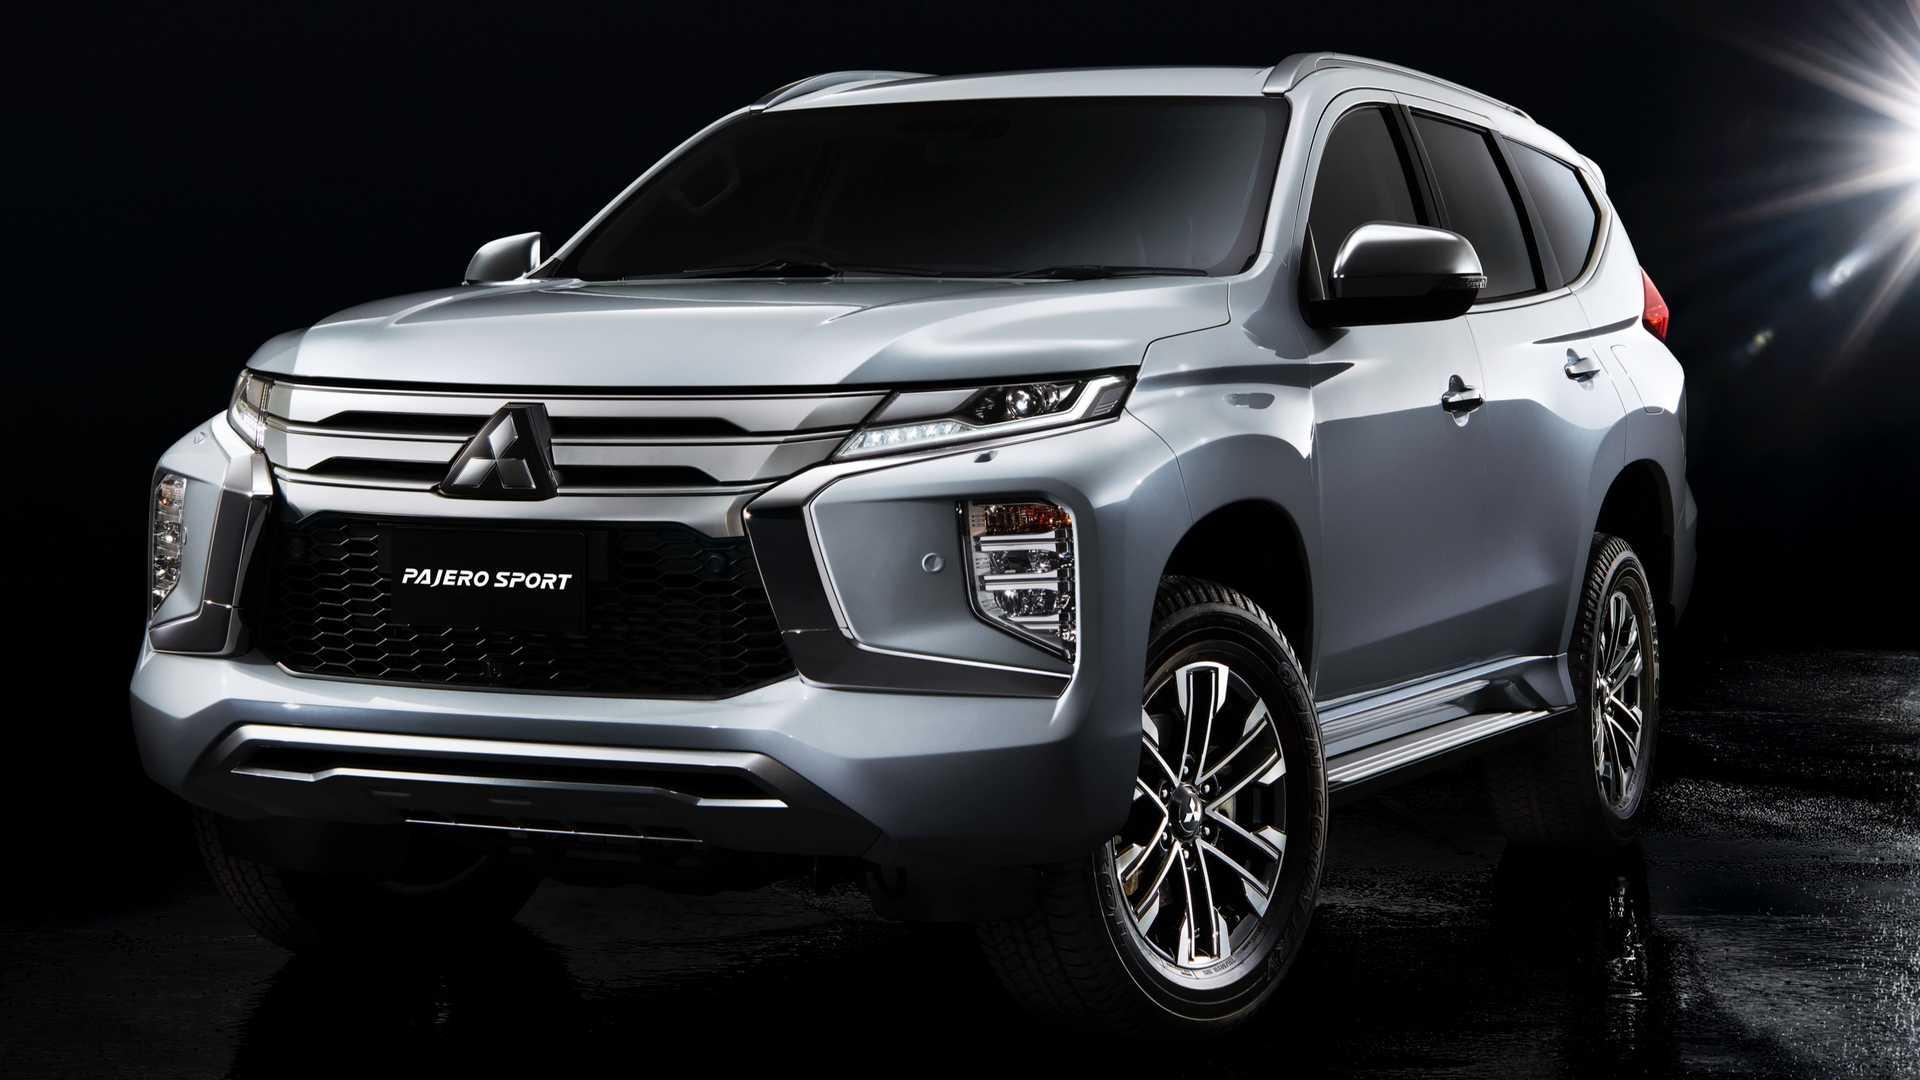 2020_Mitsubishi_Pajero_Sport_facelift_0010